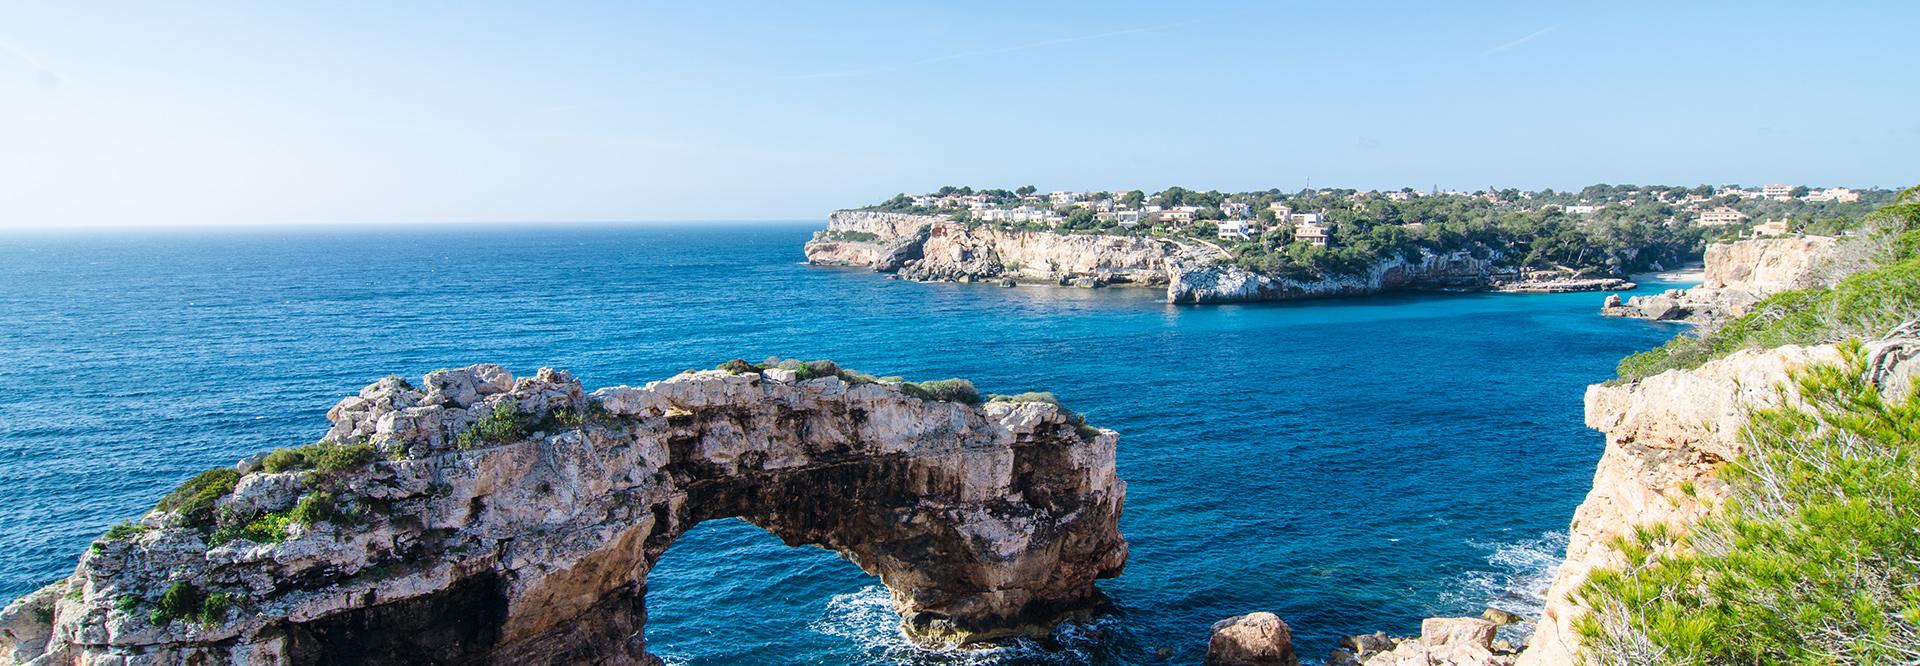 Yoga-Urlaub-Mallorca-s4